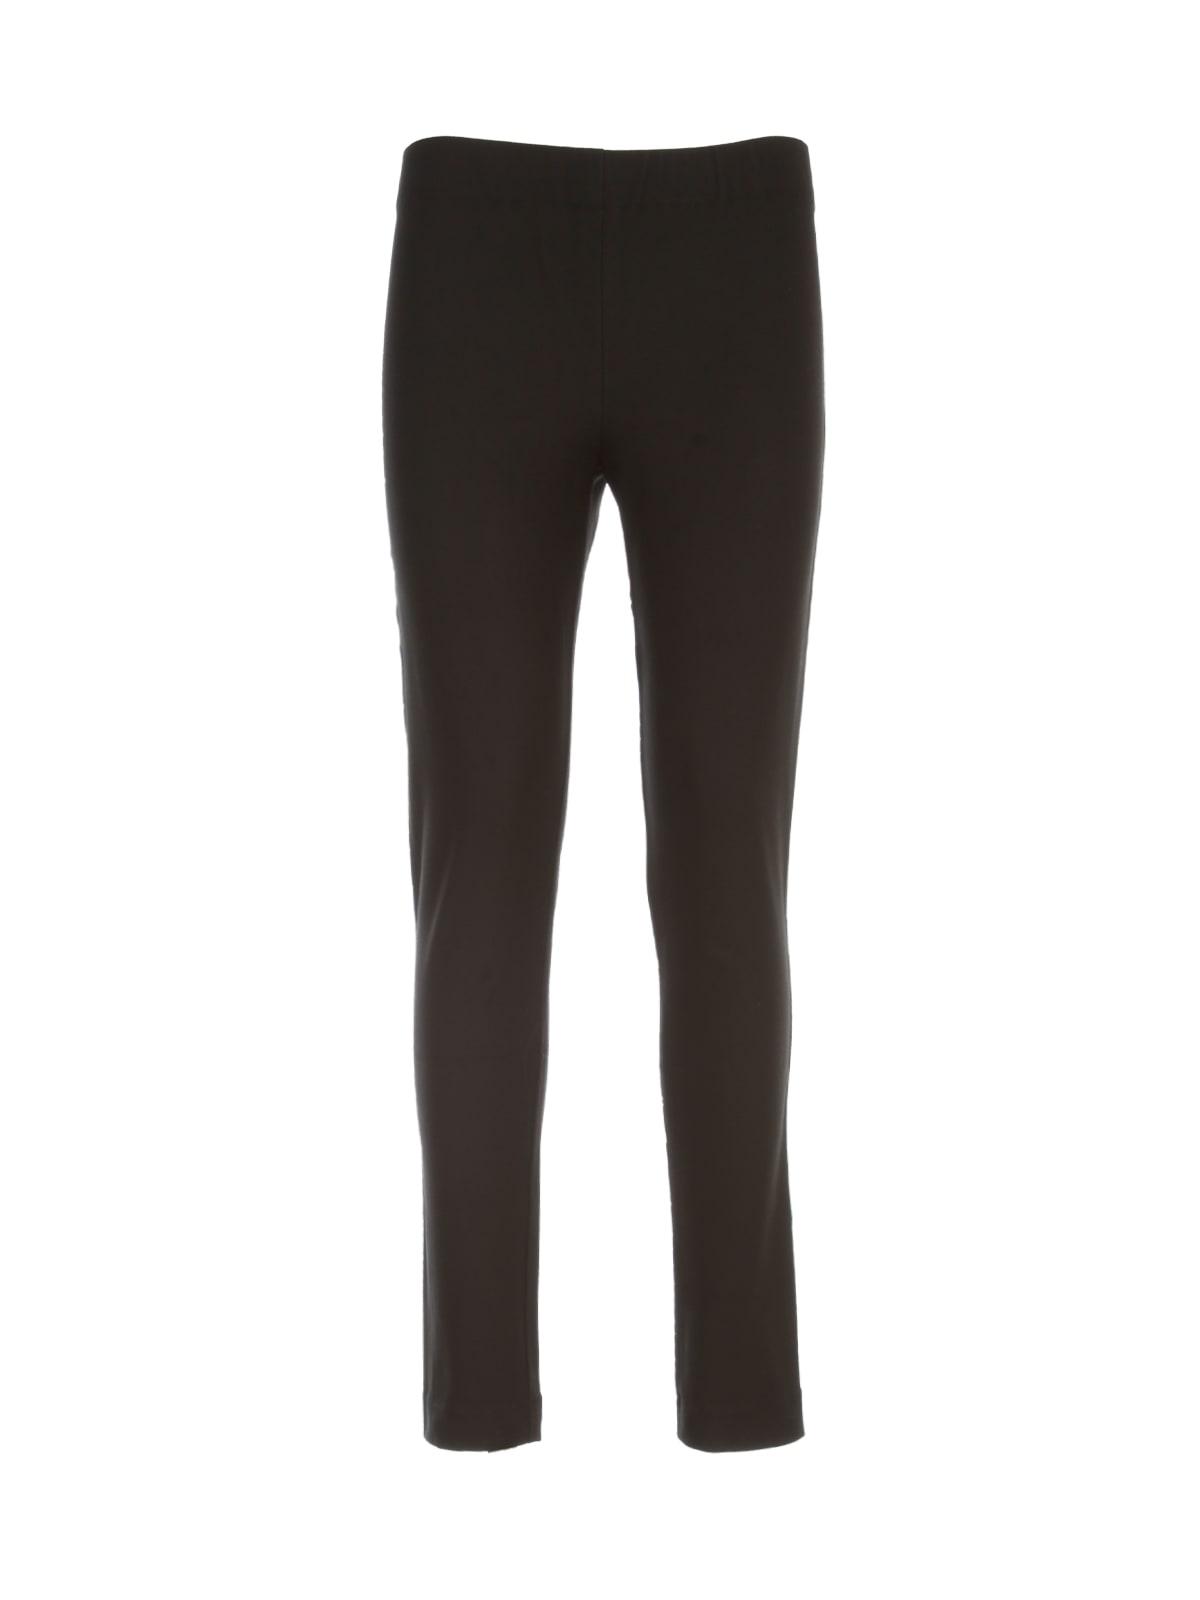 Pants Leggings Bistretch